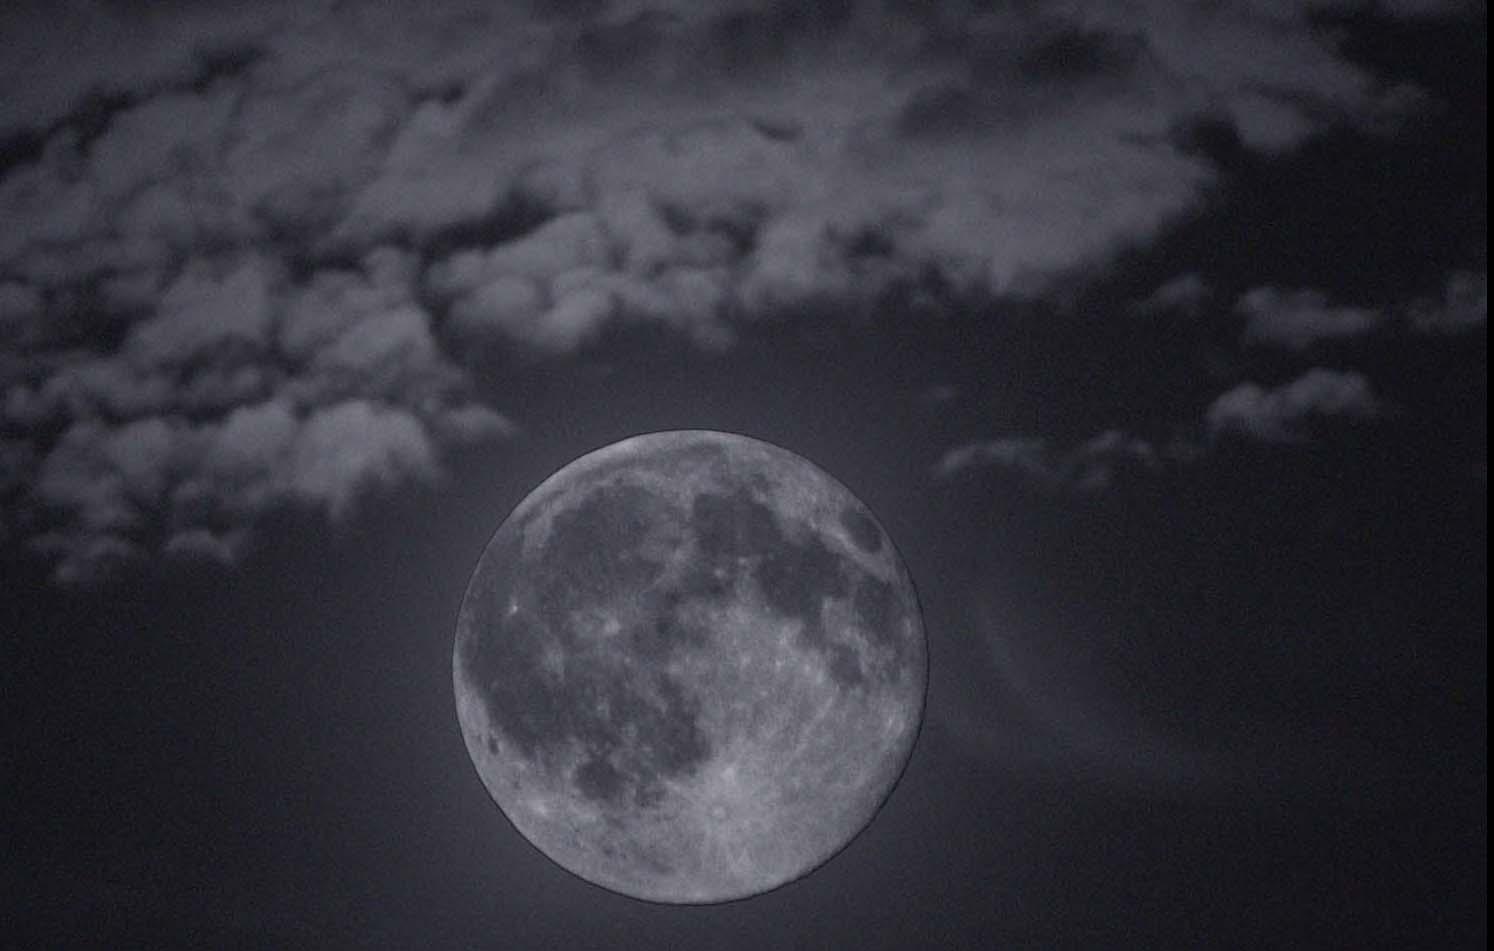 Full,Moon,Cheshire,warrington,UK,England,clouds,dusk,365days,B/W,black,white,mono,monochrome,tonysmith,tony,smith,noche,nuit,hotpix!